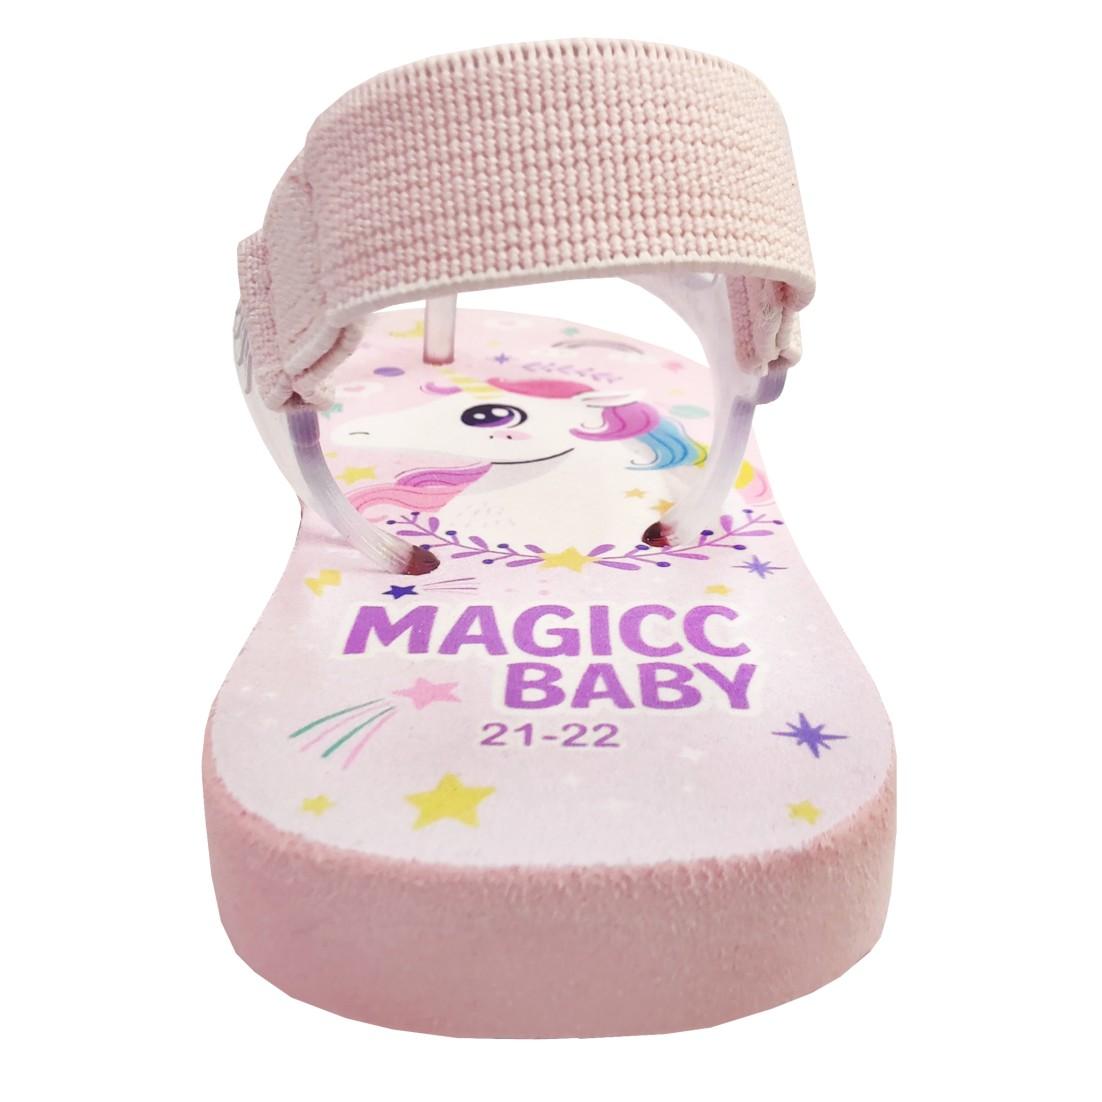 Chinelo Menina Bebê Sandália Unicórnio Magicc Baby